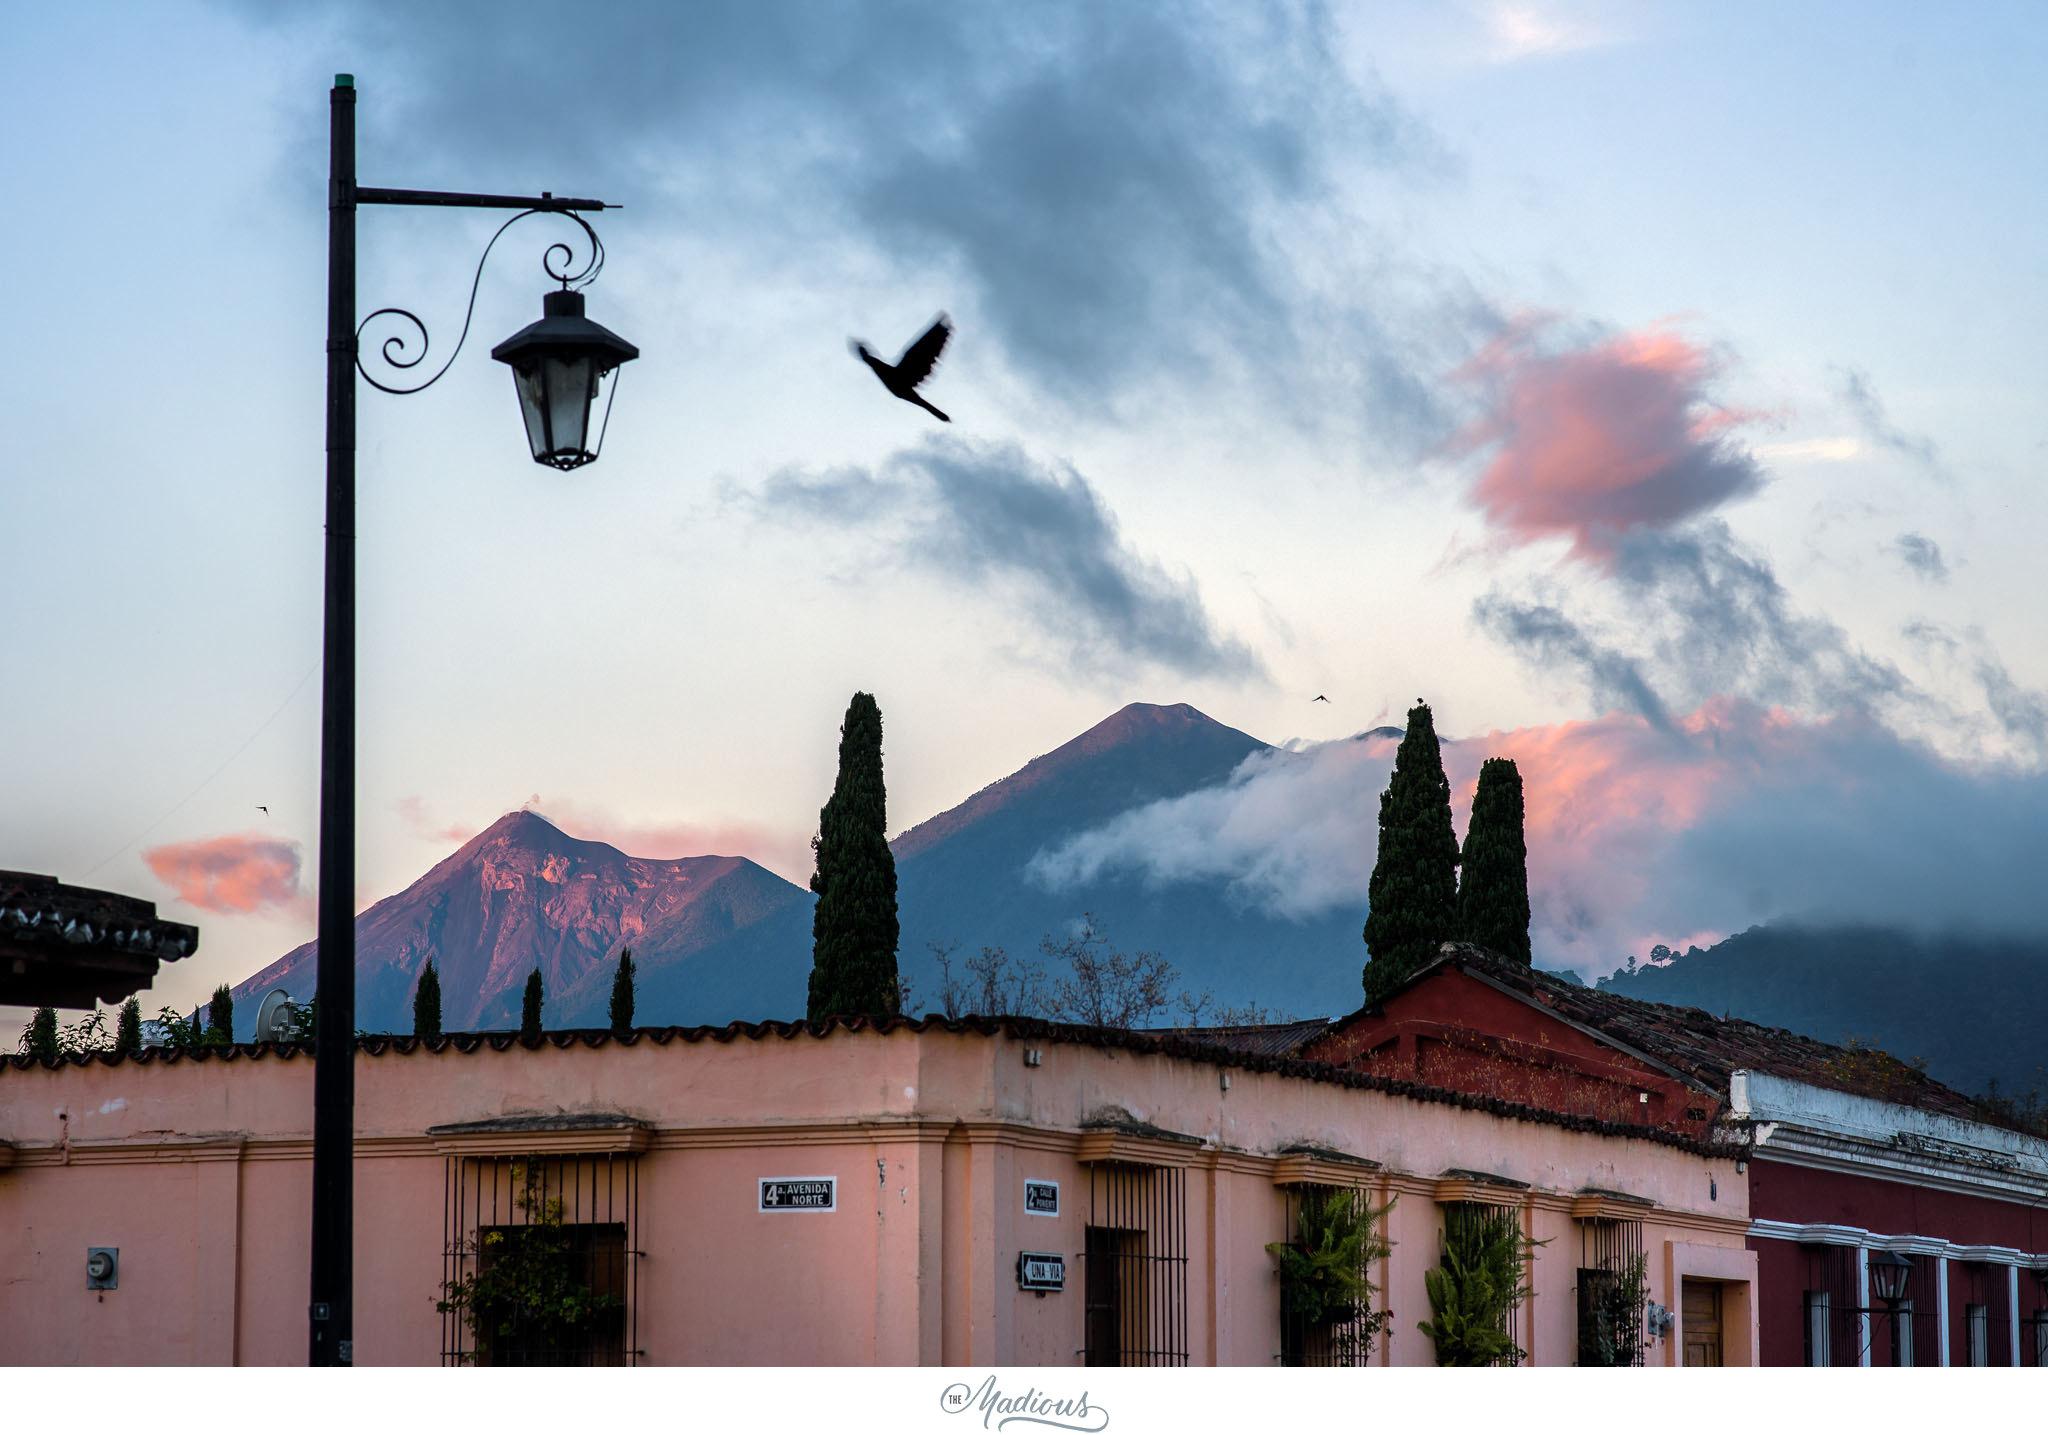 Leigh_Rob_Antigua_Guatemala_Santa_Clara_Destination_Wedding_04.JPG